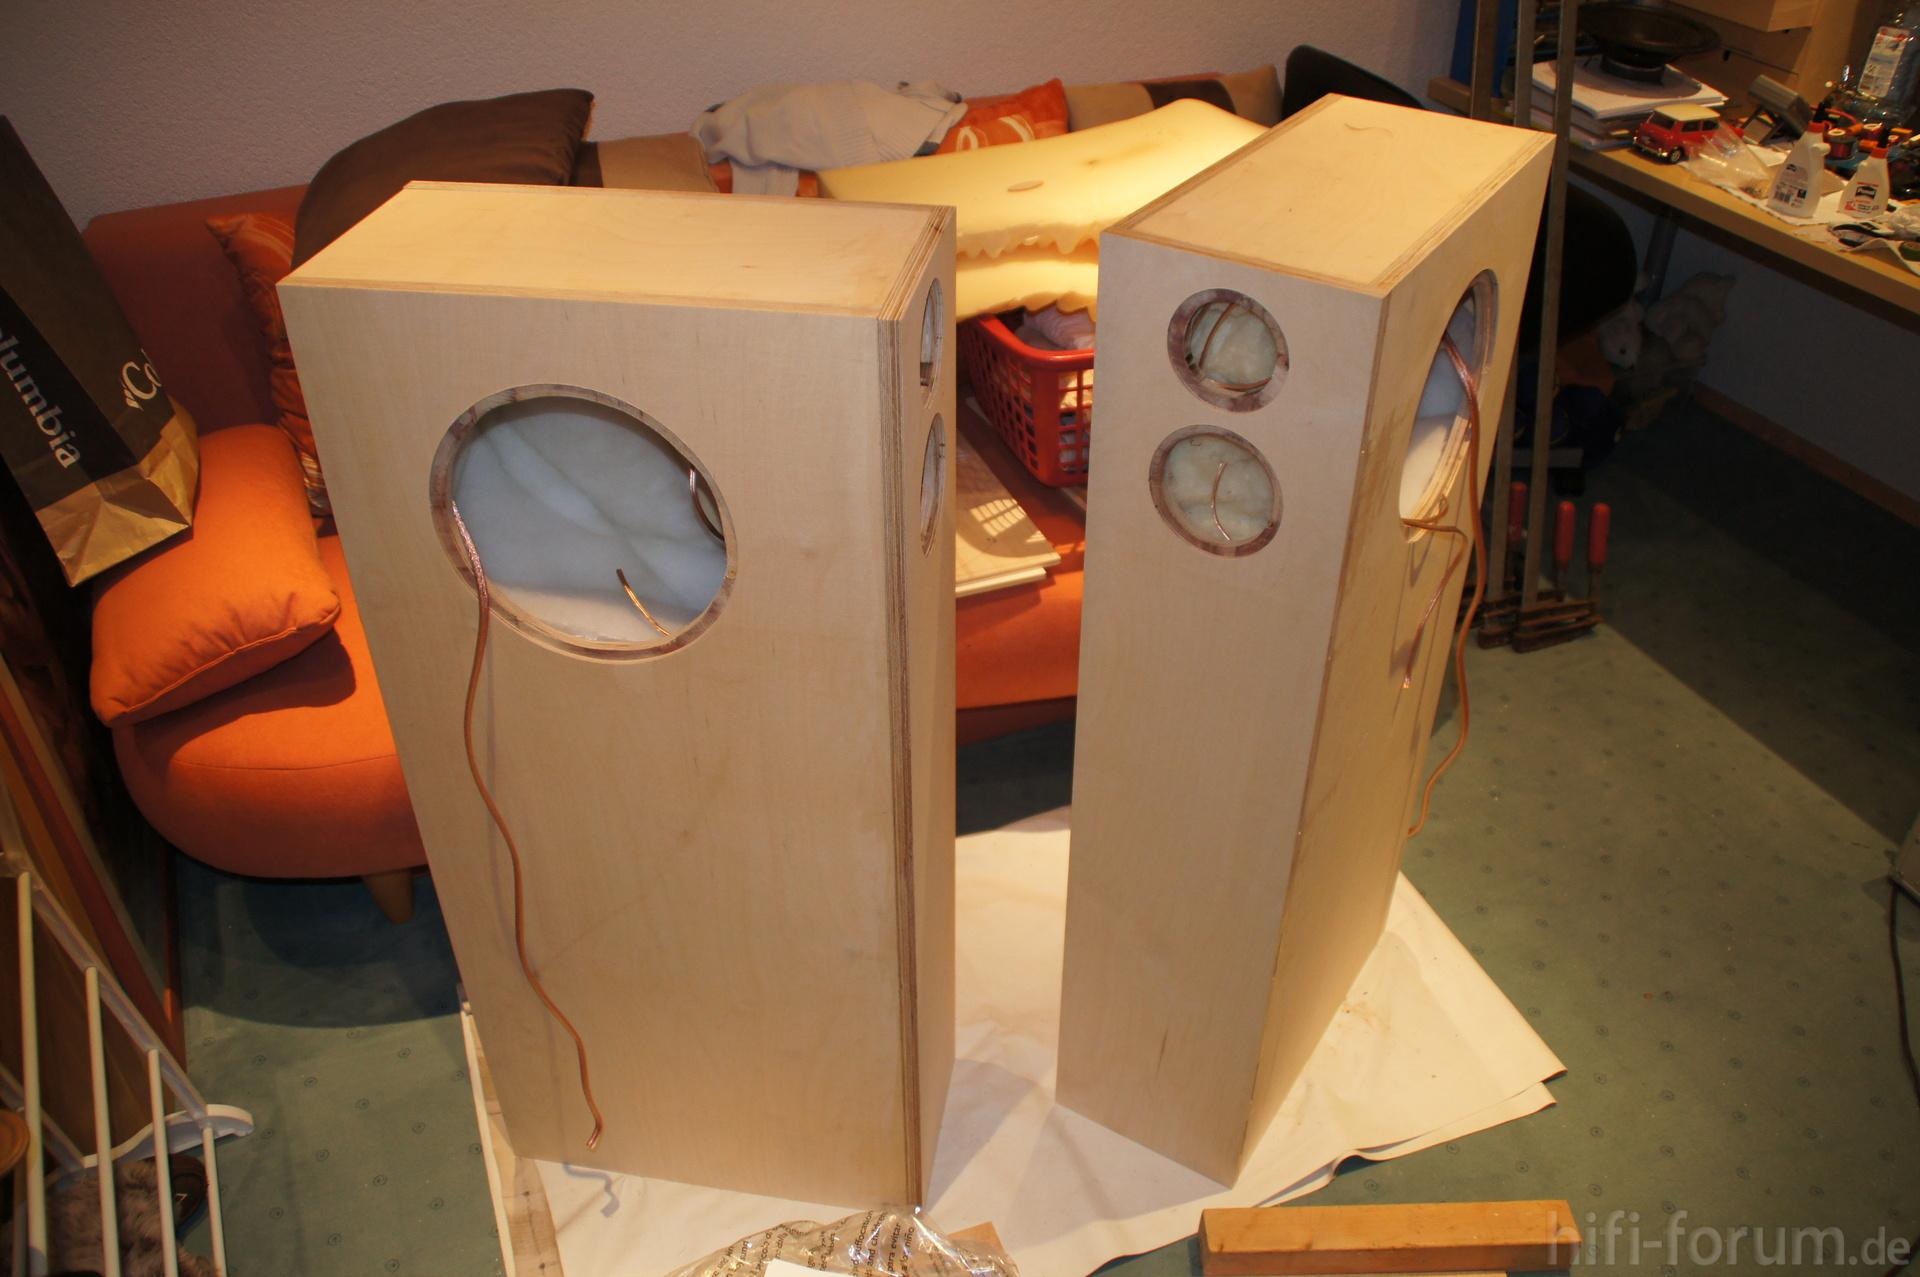 geh use gesamt doityourself geh use gesamt lautsprecher hifi bildergalerie. Black Bedroom Furniture Sets. Home Design Ideas